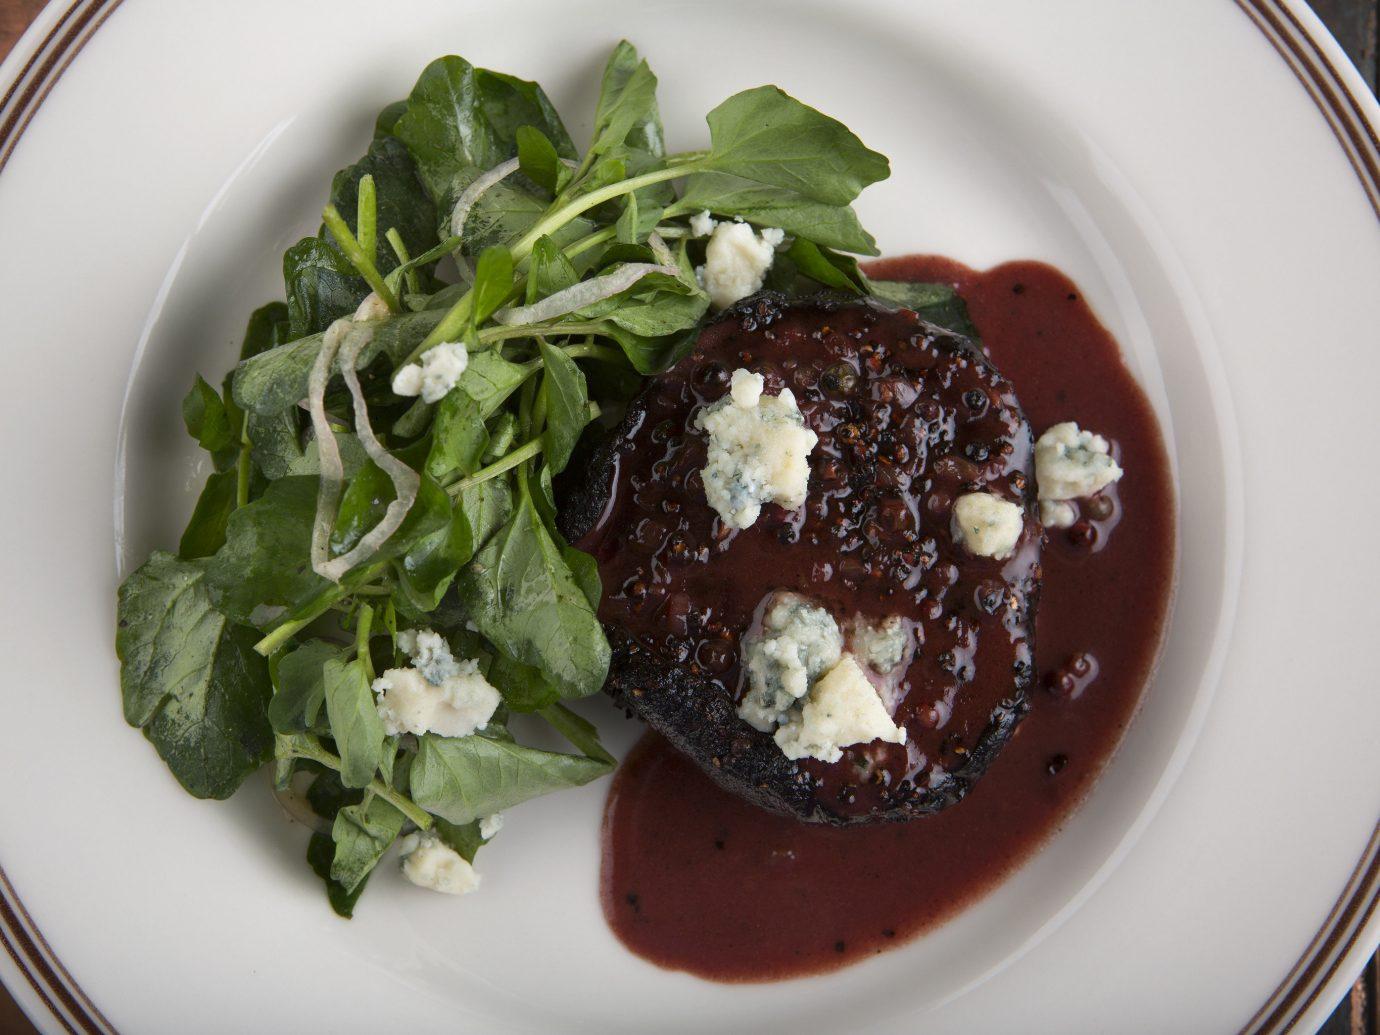 Food + Drink plate food dish indoor produce white meal vegetable breakfast cuisine piece de resistance